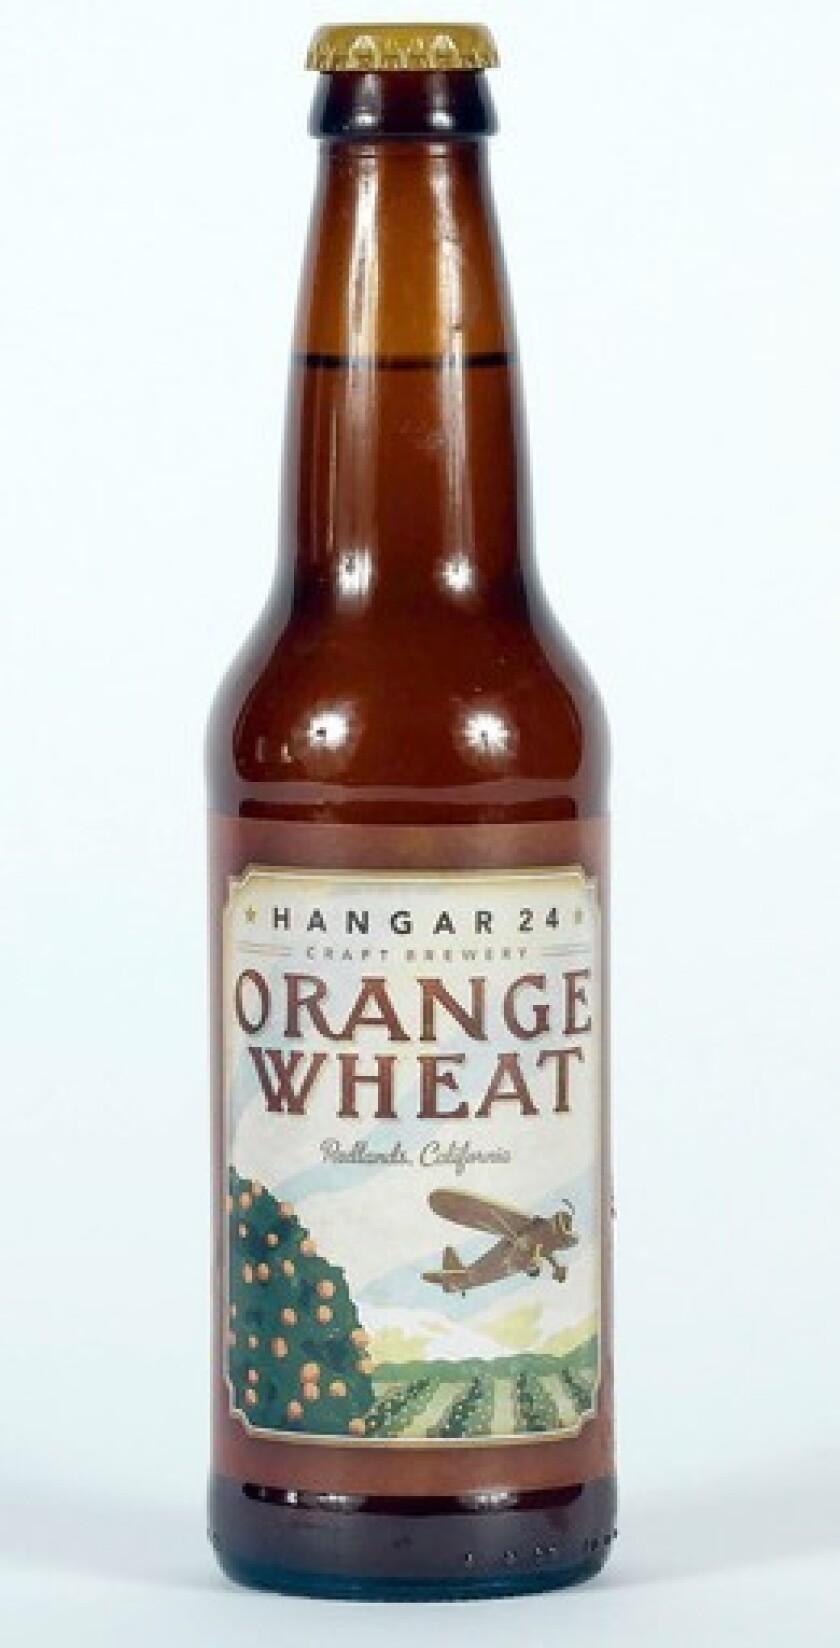 Hangar 24 Orange Wheat has a true taste of orange.